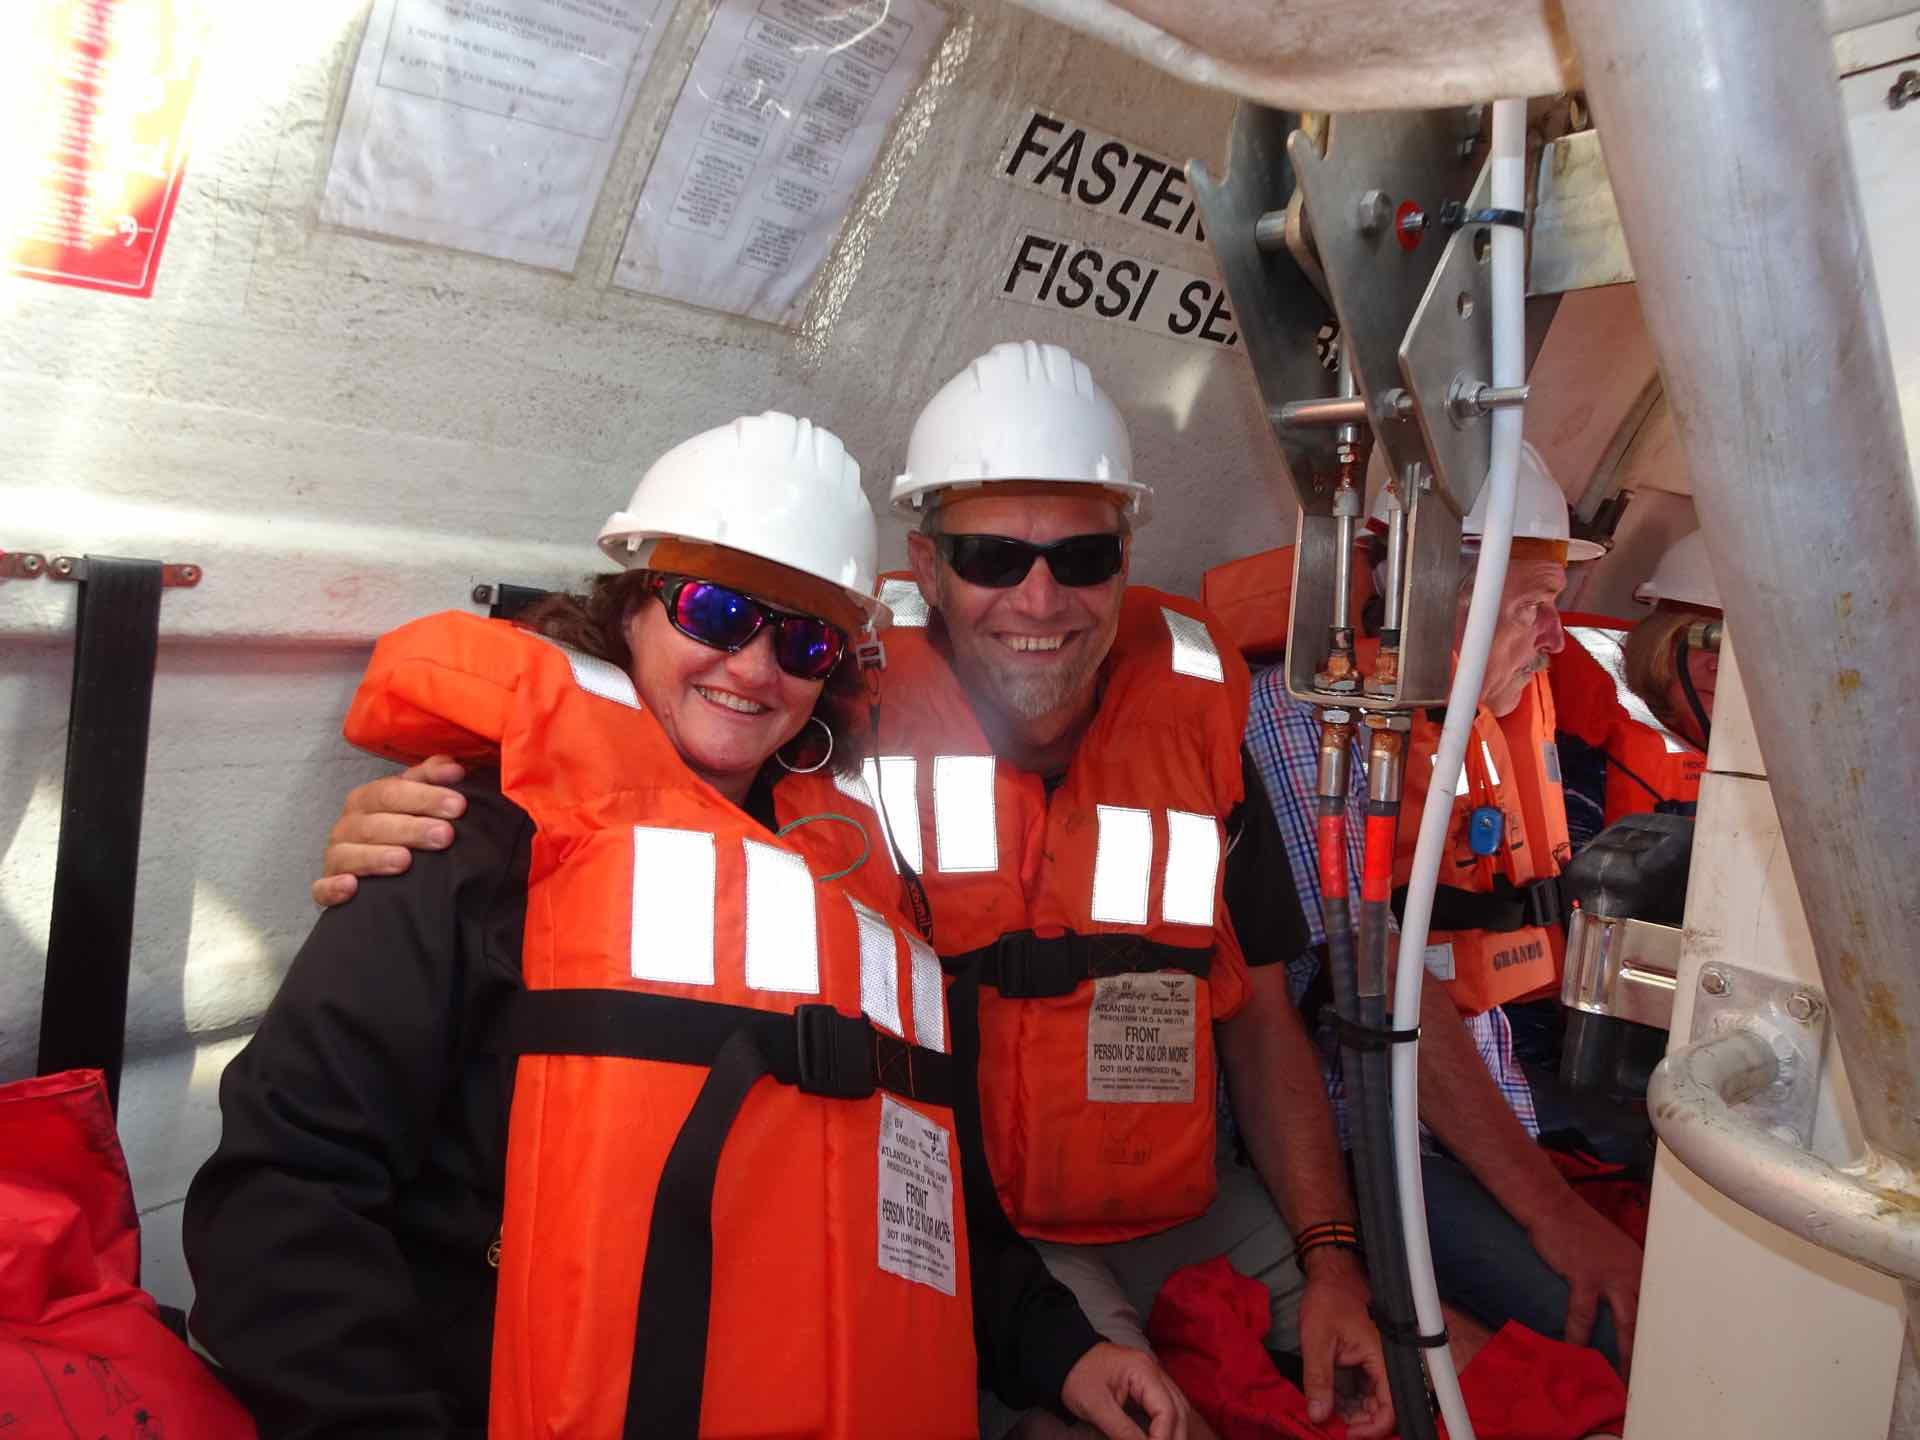 Brütende Hitze im Lifeboat